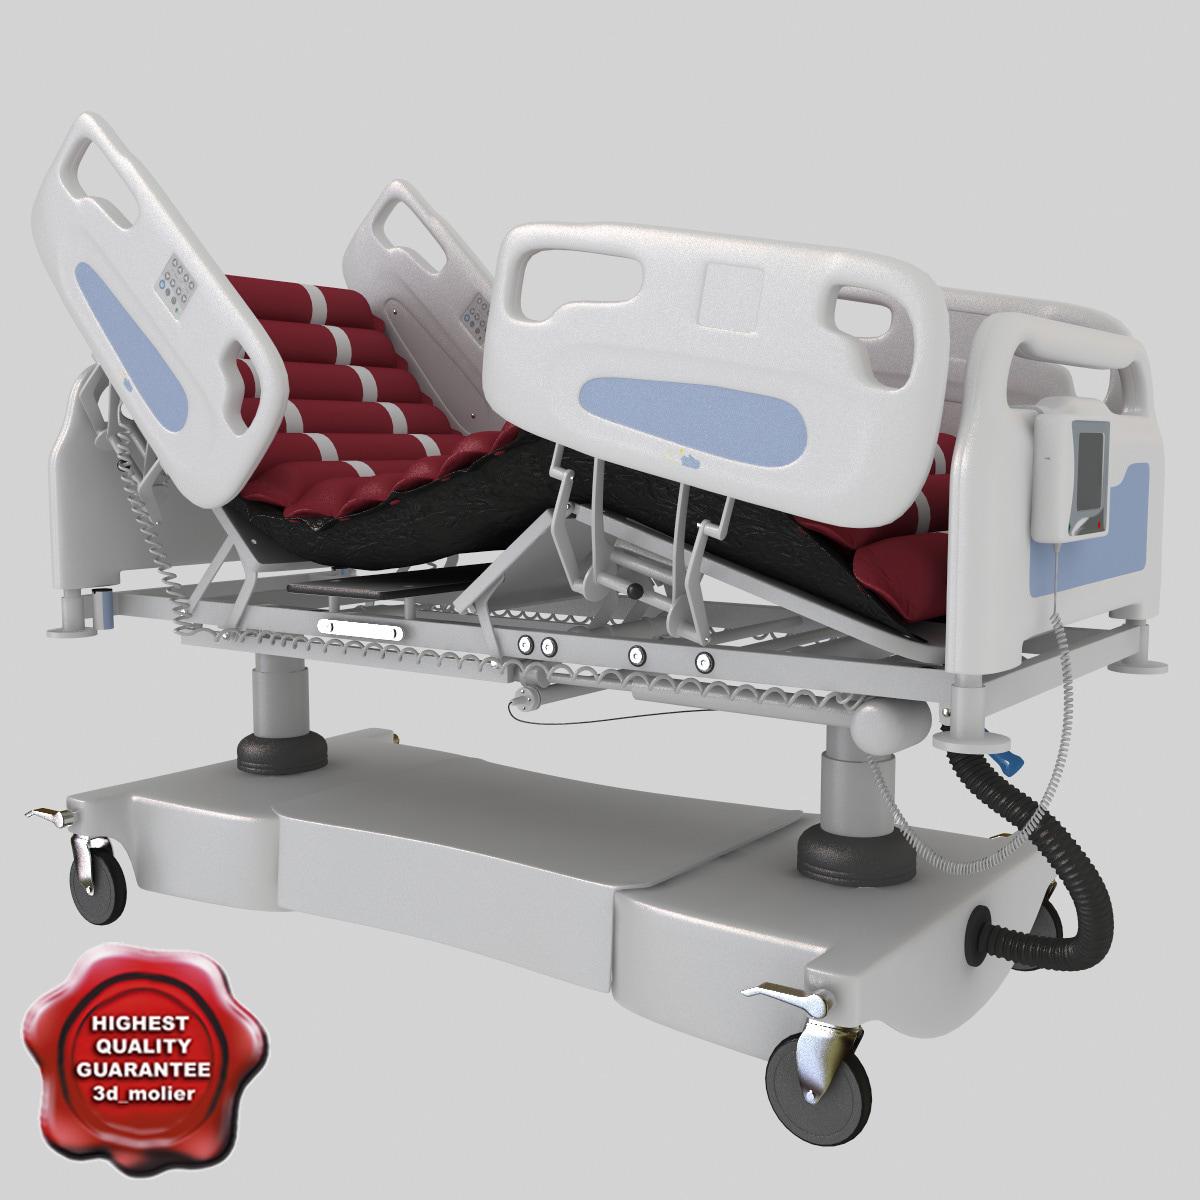 ICU_Multi_Function_Hospital_Bed_THR-IC-15_00.jpg